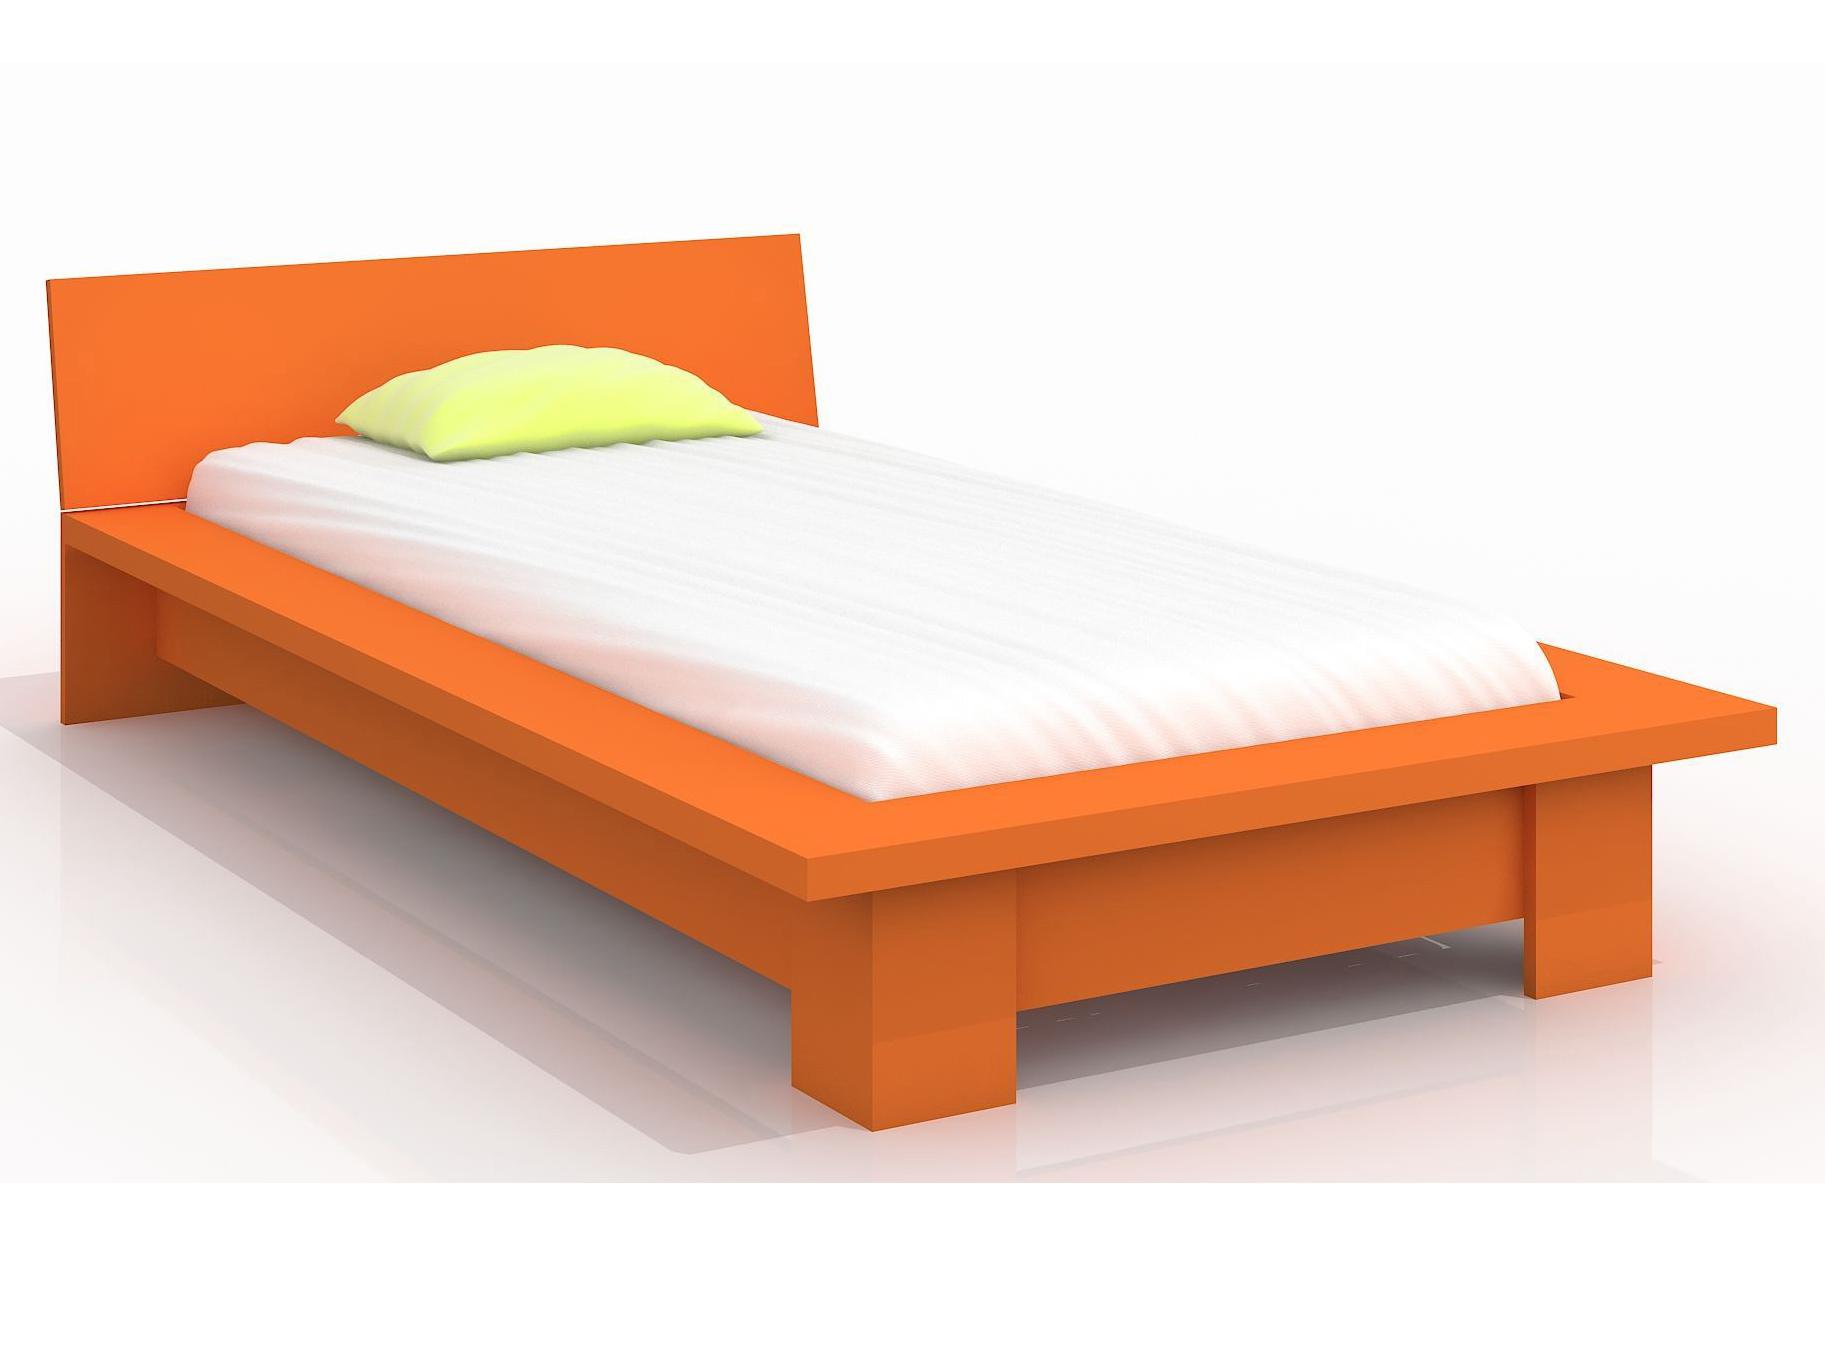 Jednolůžková postel 90 cm - Naturlig Kids - Boergund (borovice) (s roštem)